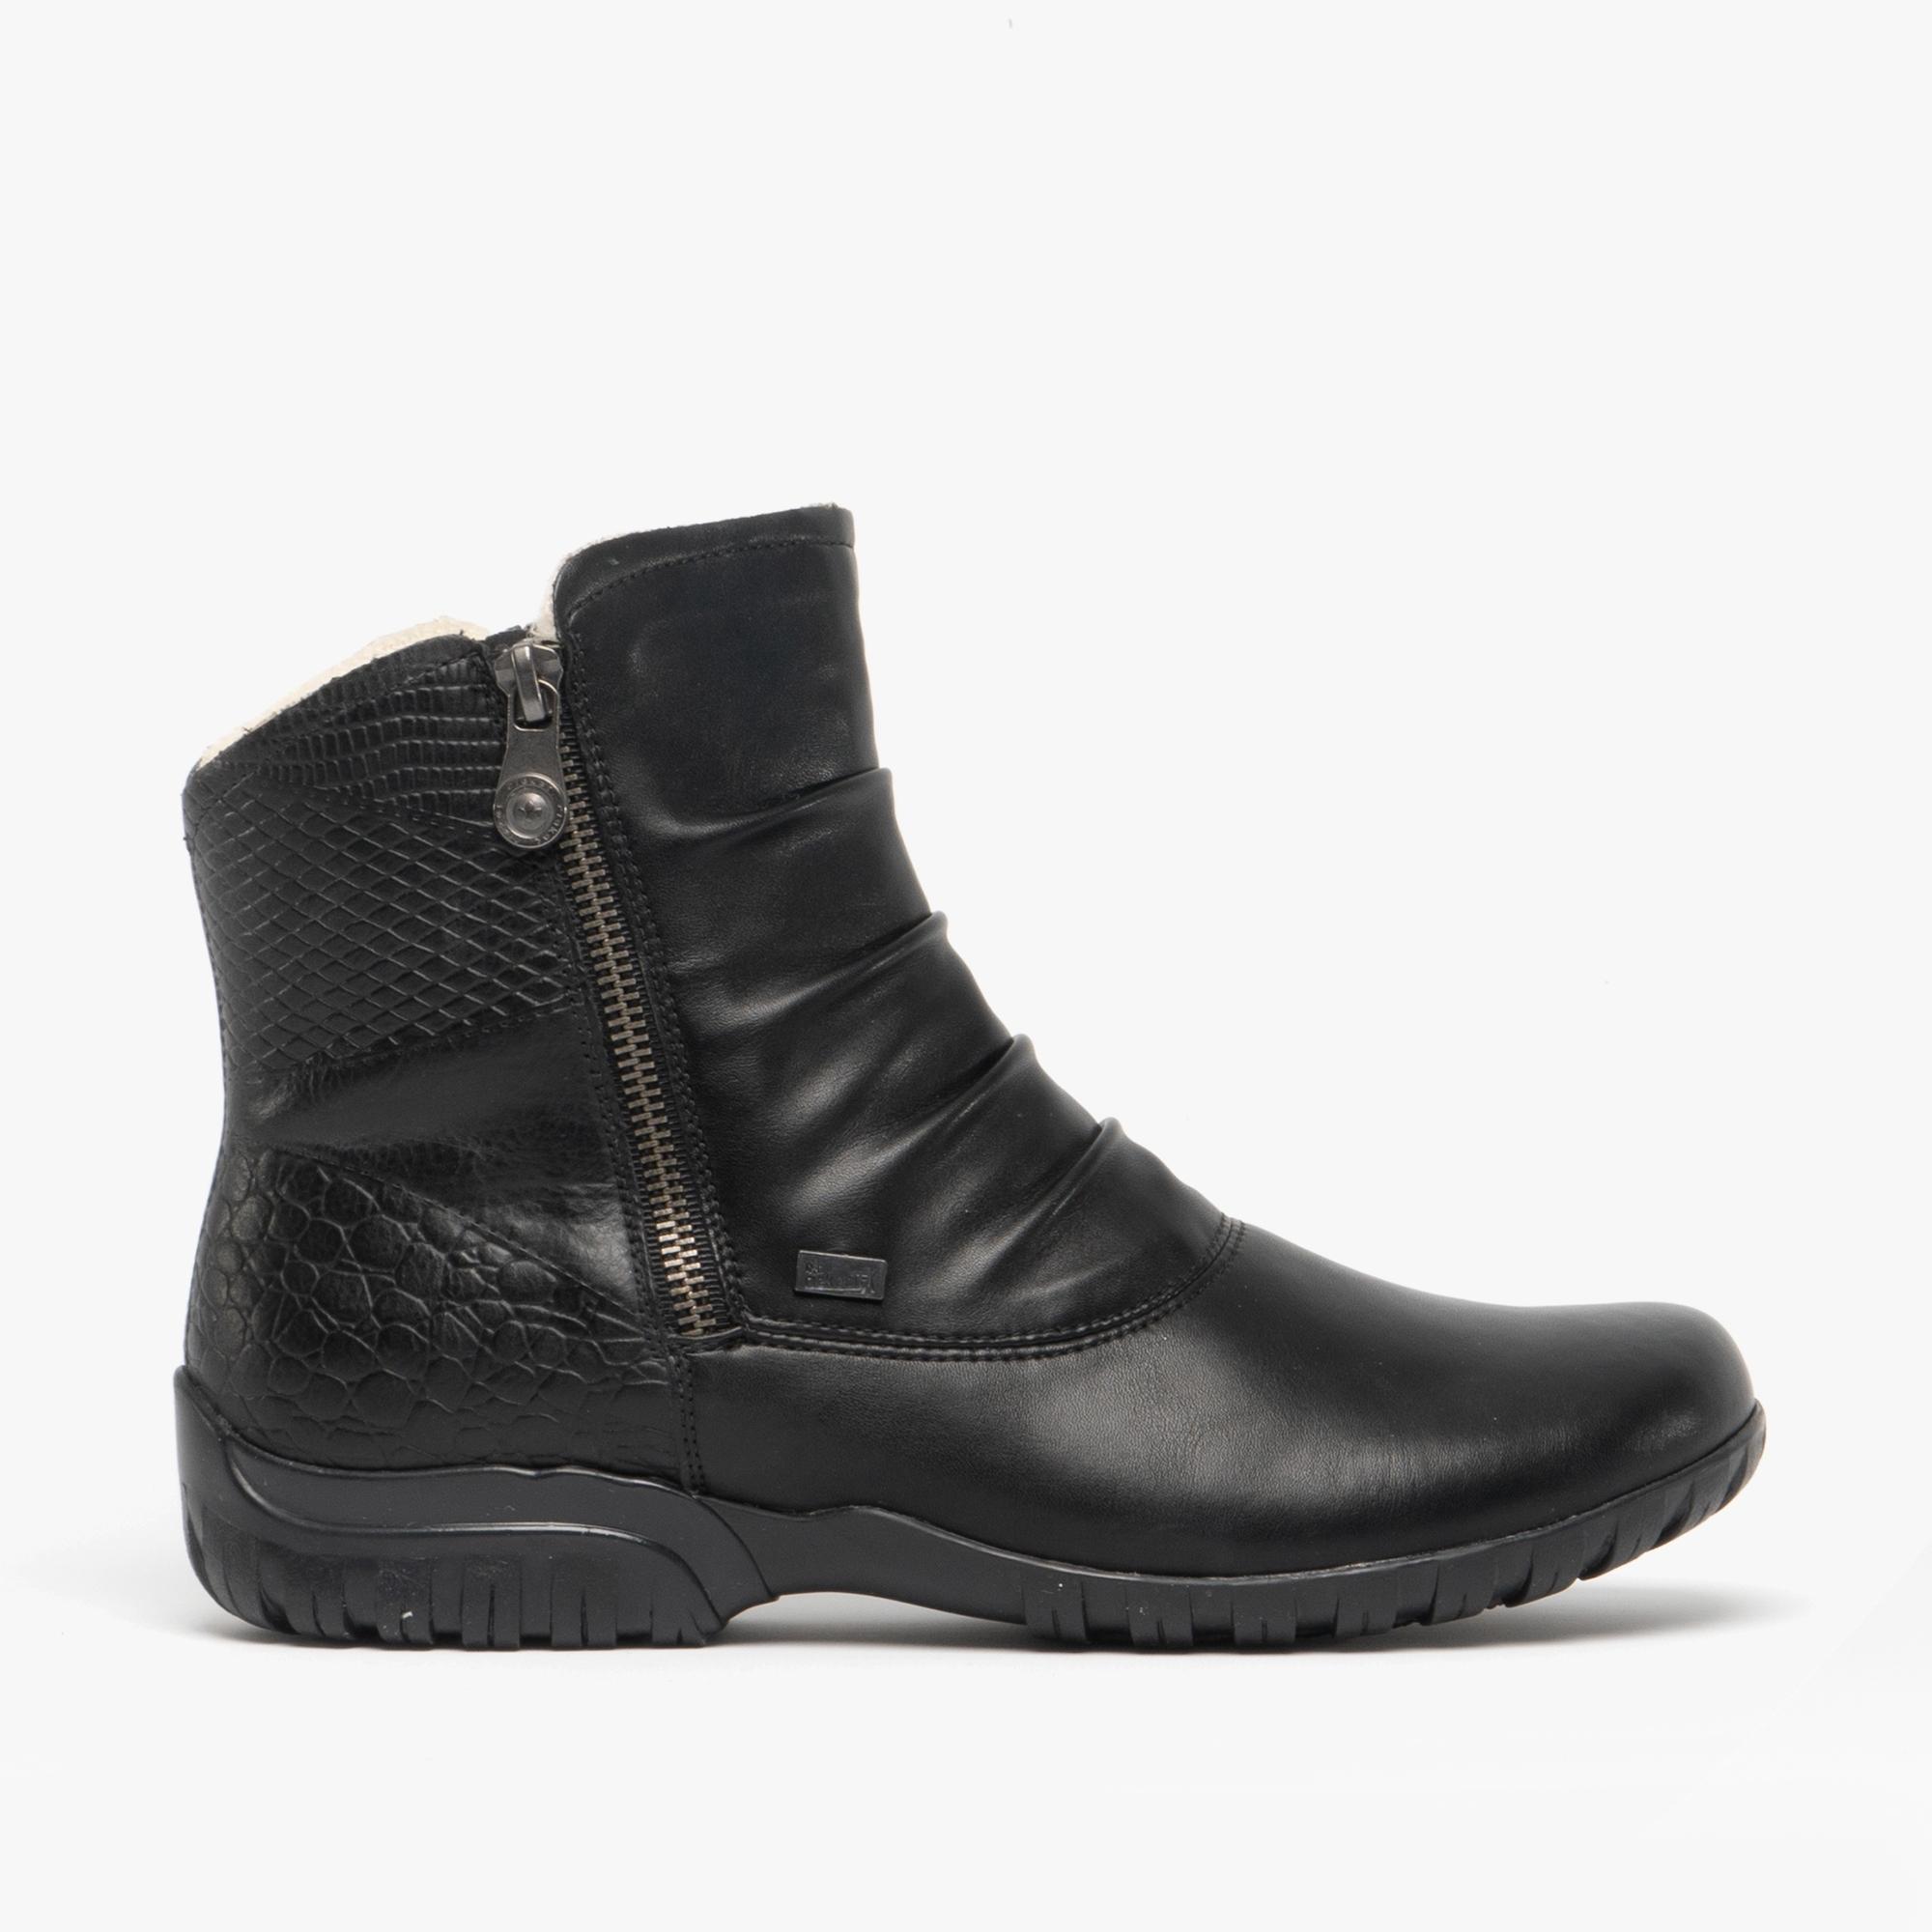 promo code 57ec8 7ed2f Rieker Z4663-01 TEX Ladies Warm Lined Winter Boots Black